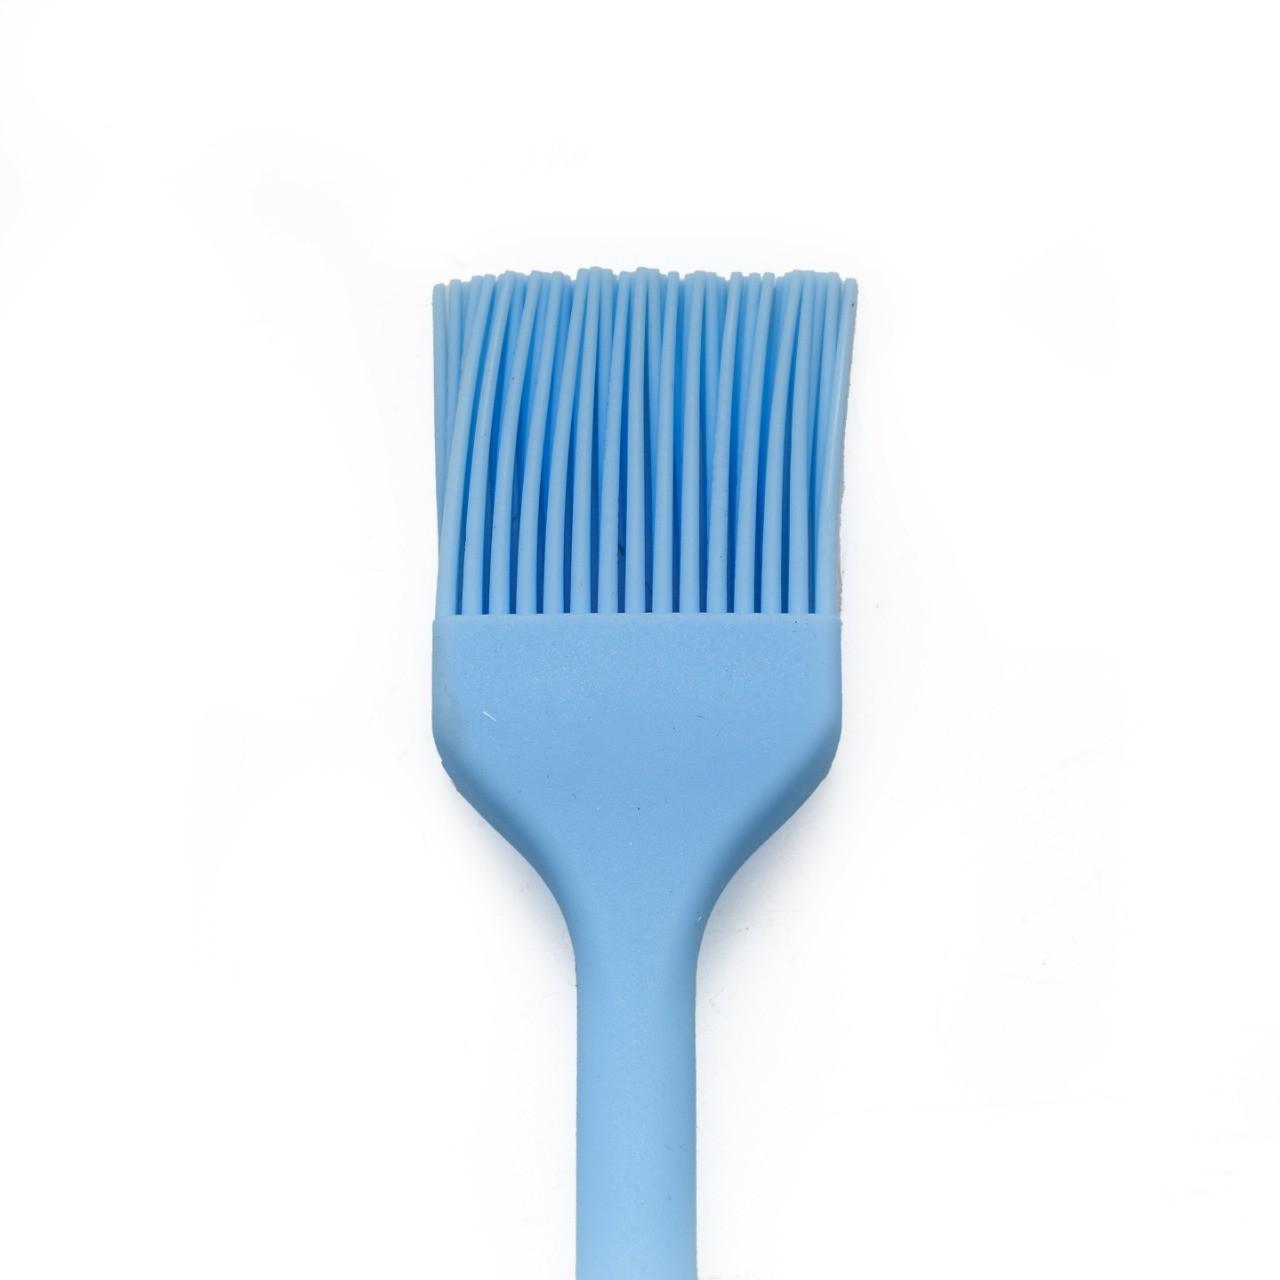 Pincel Cozinha Silicone Azul Pincelar Carne Massas Untar Forma  -  Mothelucci Loja online